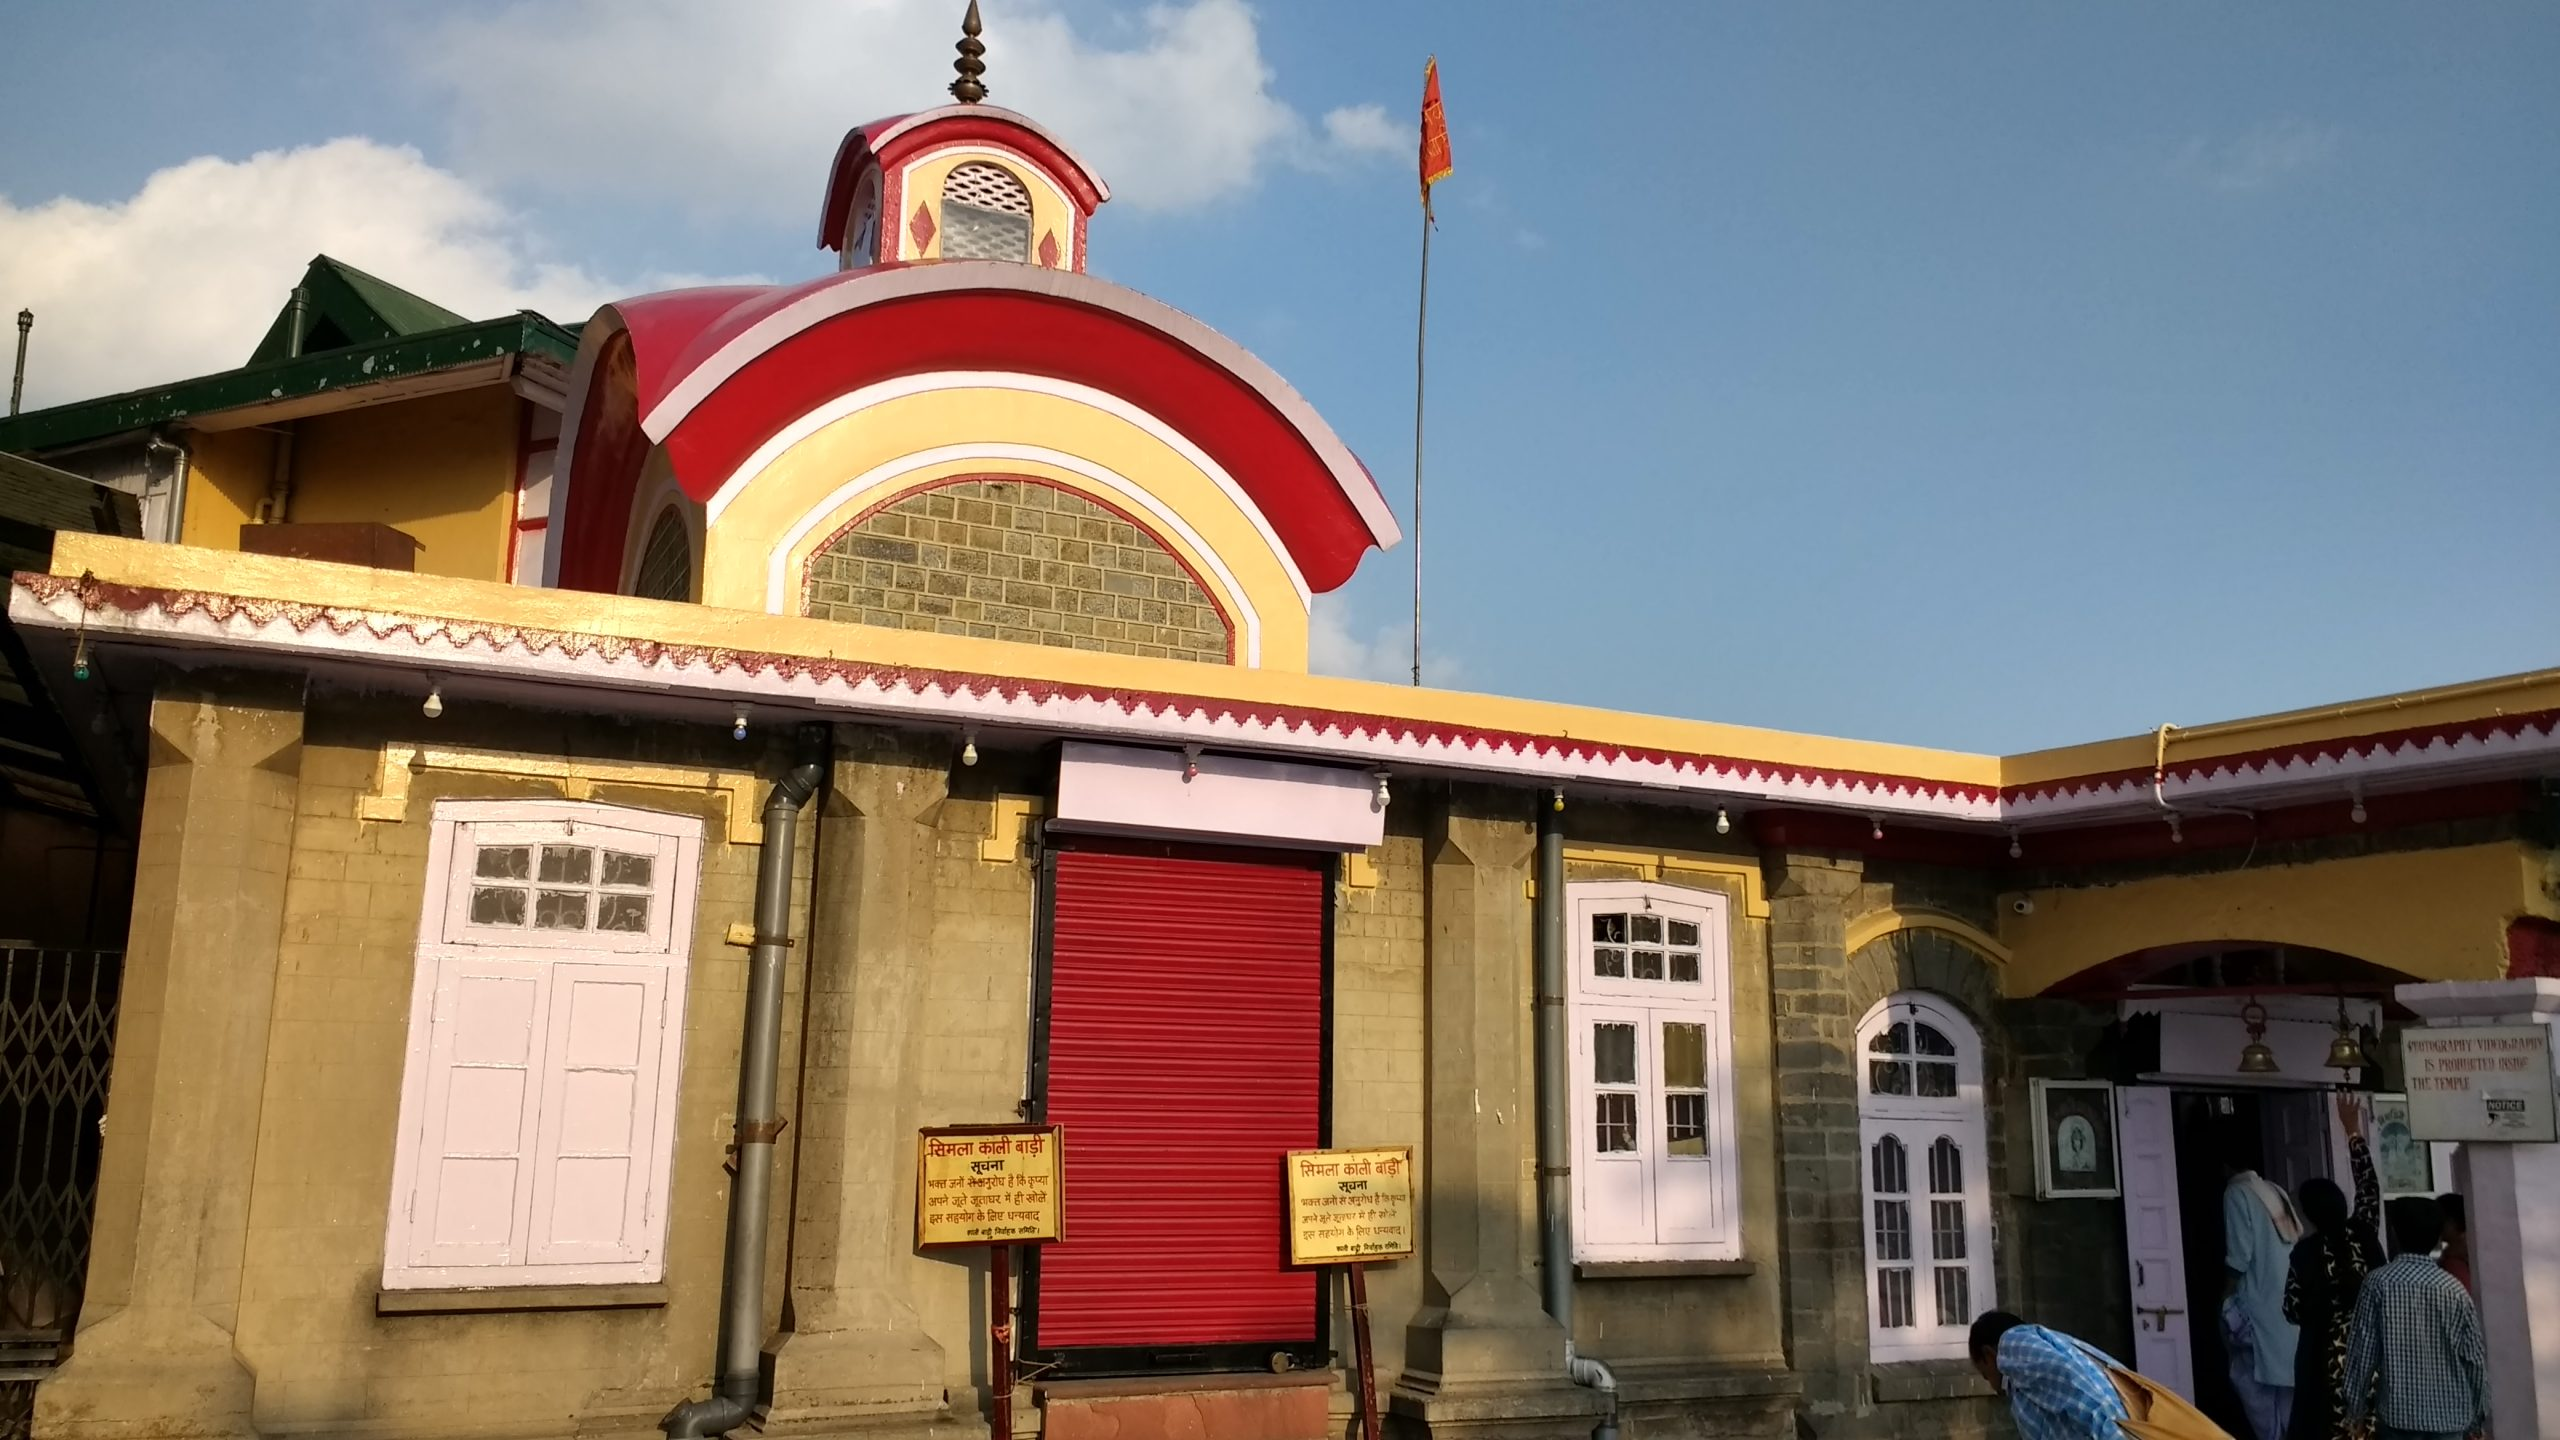 Kali Bari Temple-Amazing Place to Visit in Shimla and Kufri